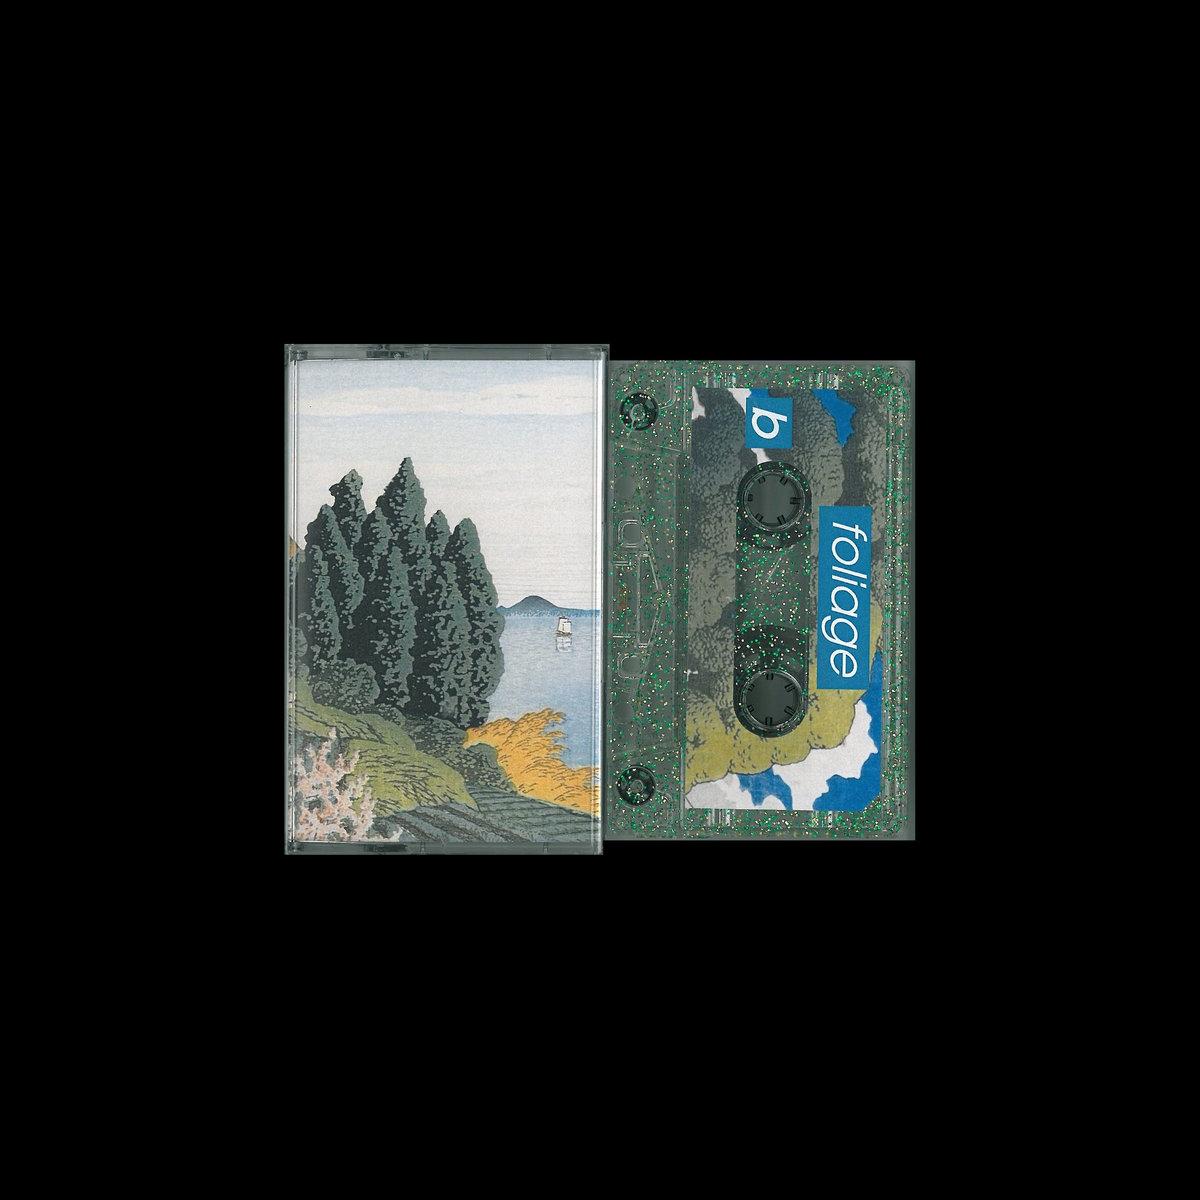 III - Foliage (Z Tapes)